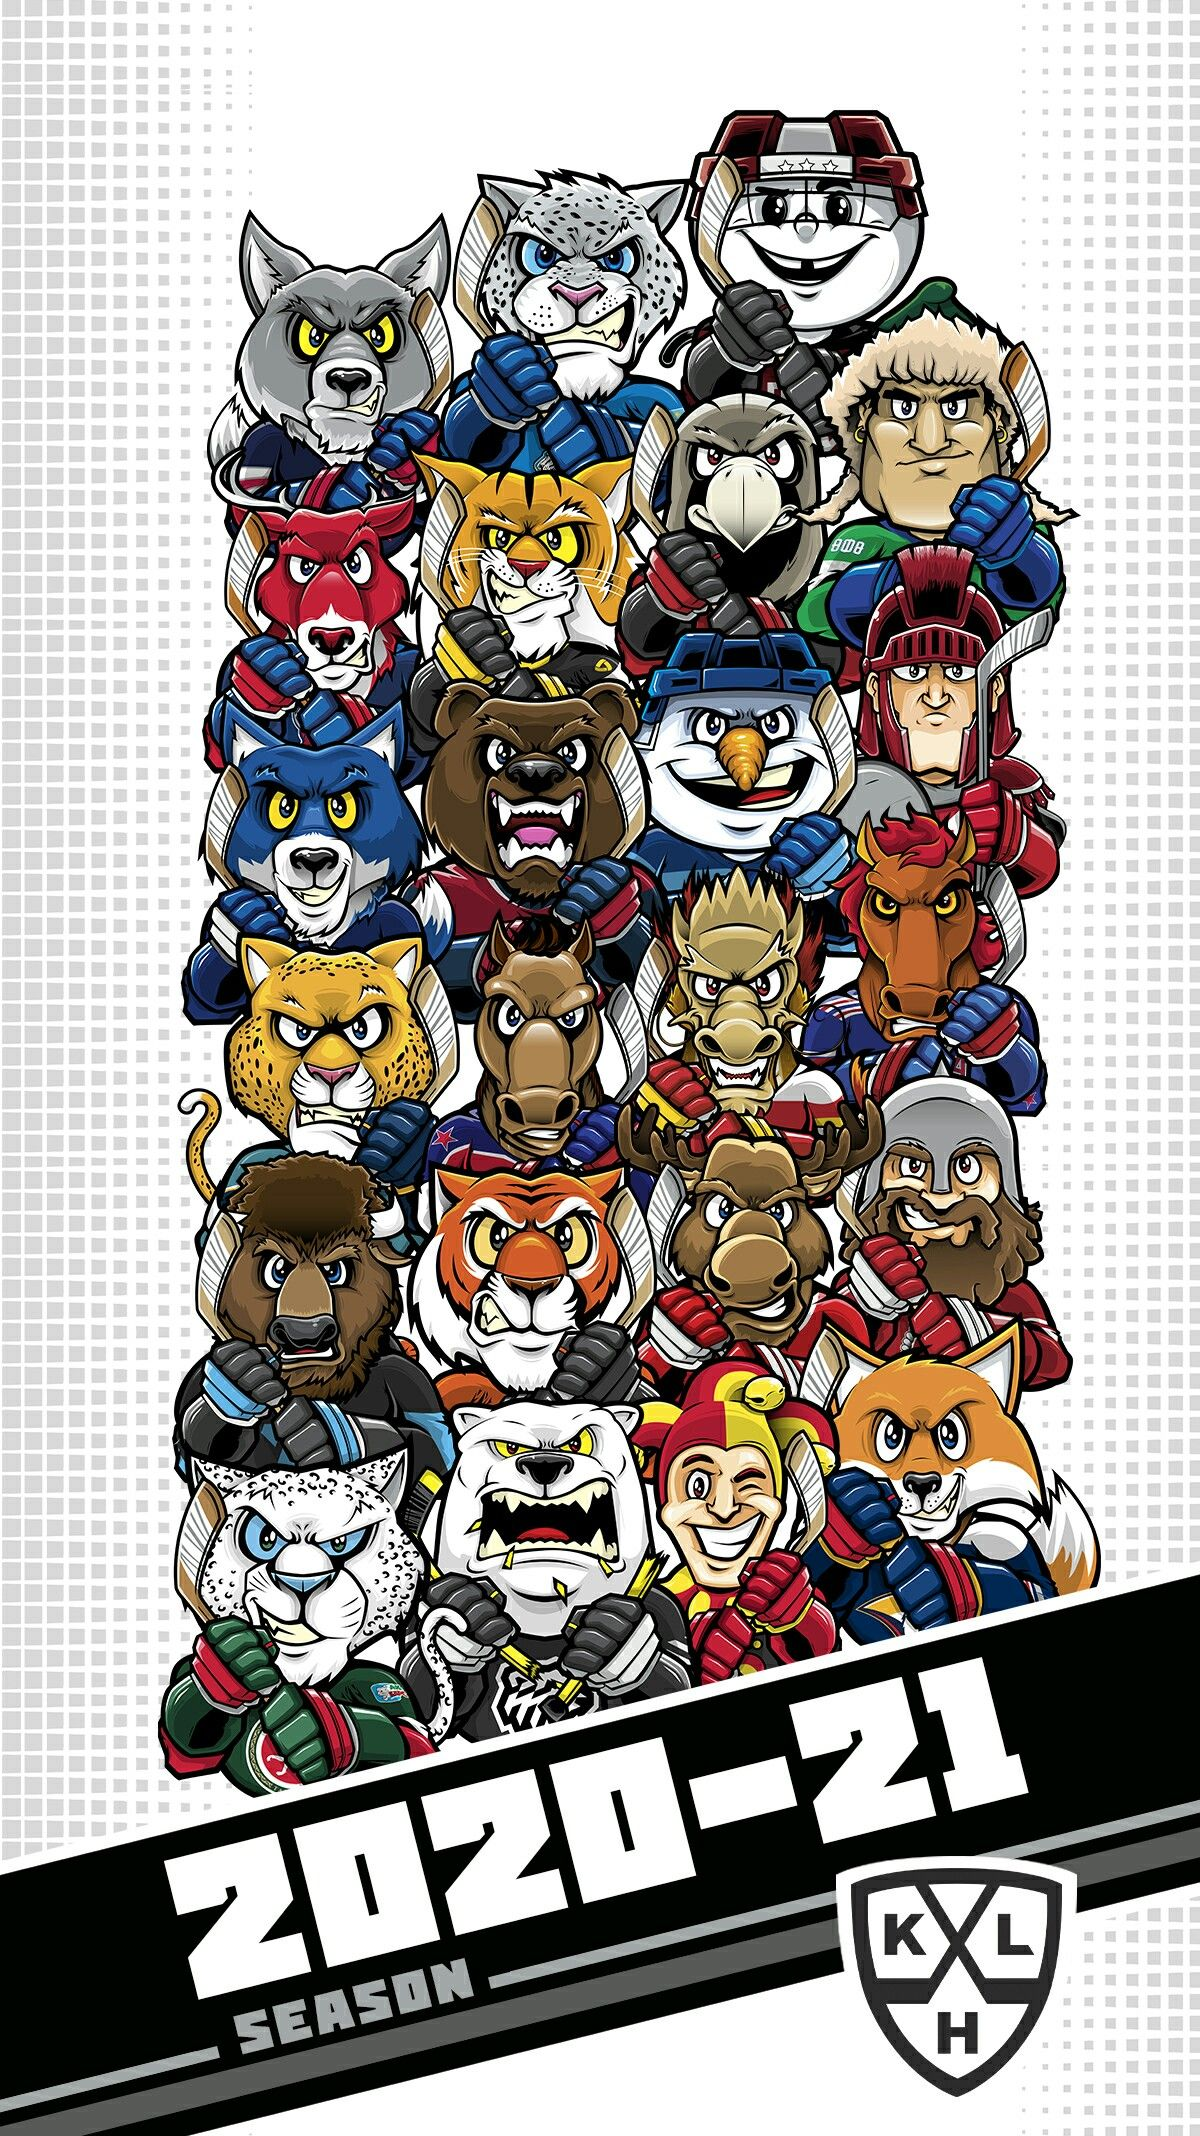 The 2021 KHL Season in 2020 Kontinental hockey league